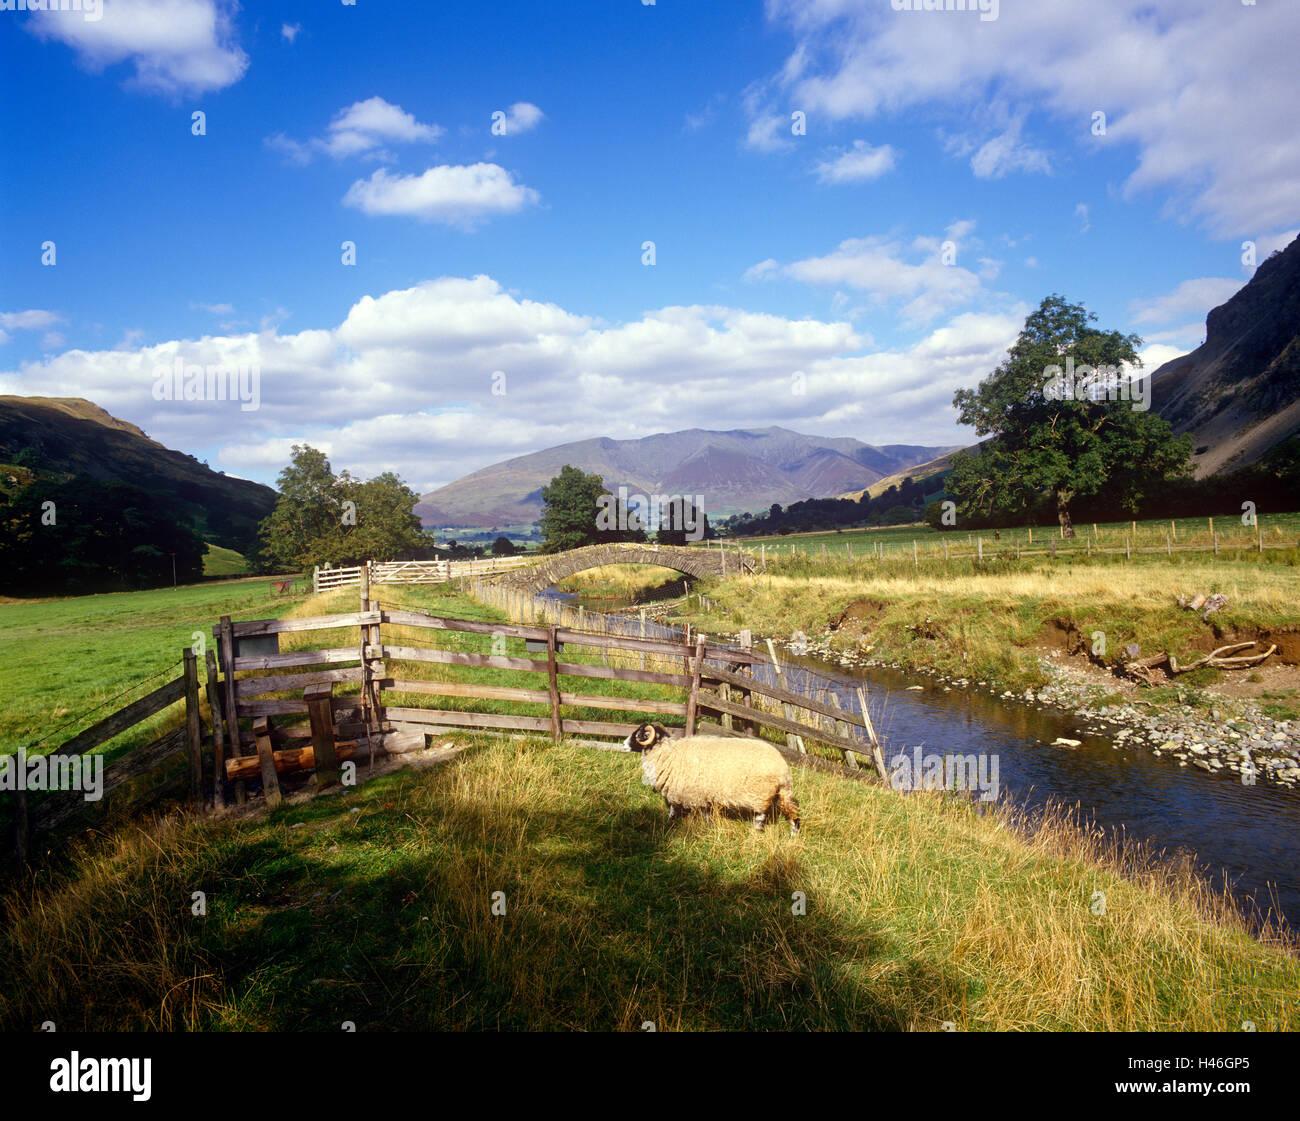 St.Johns in Vale, Cumbria - Stock Image